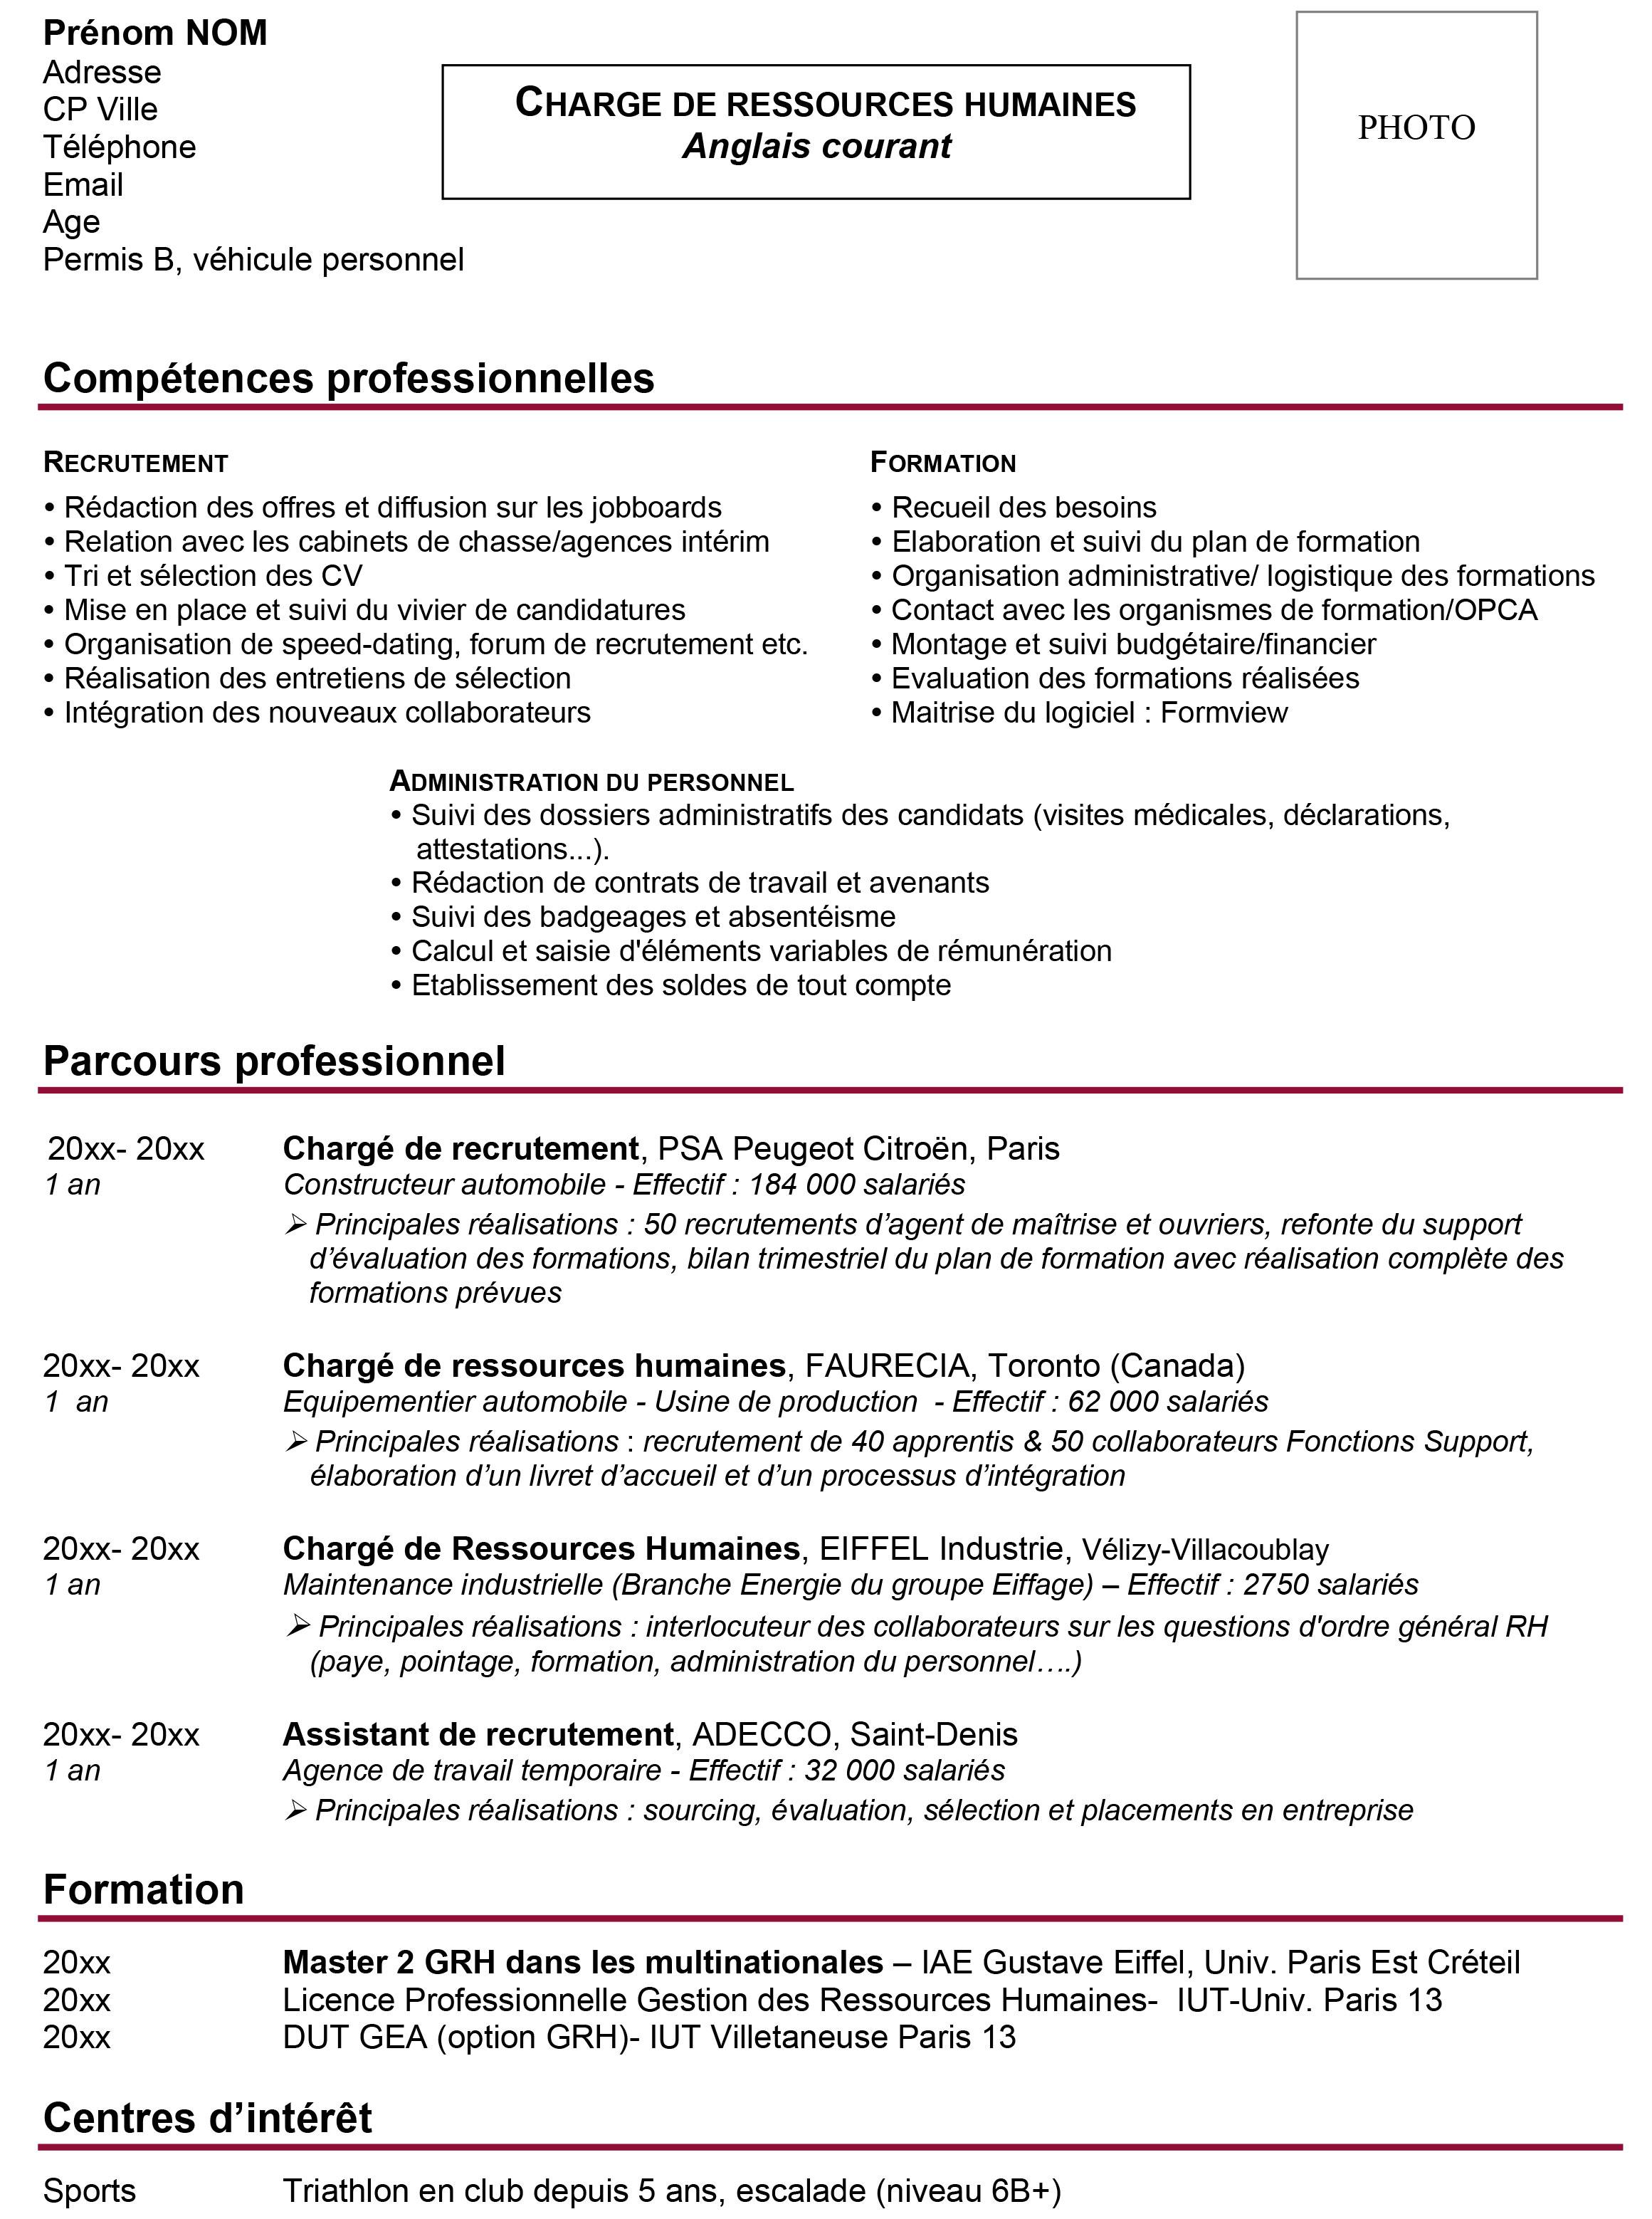 conseil cv competences